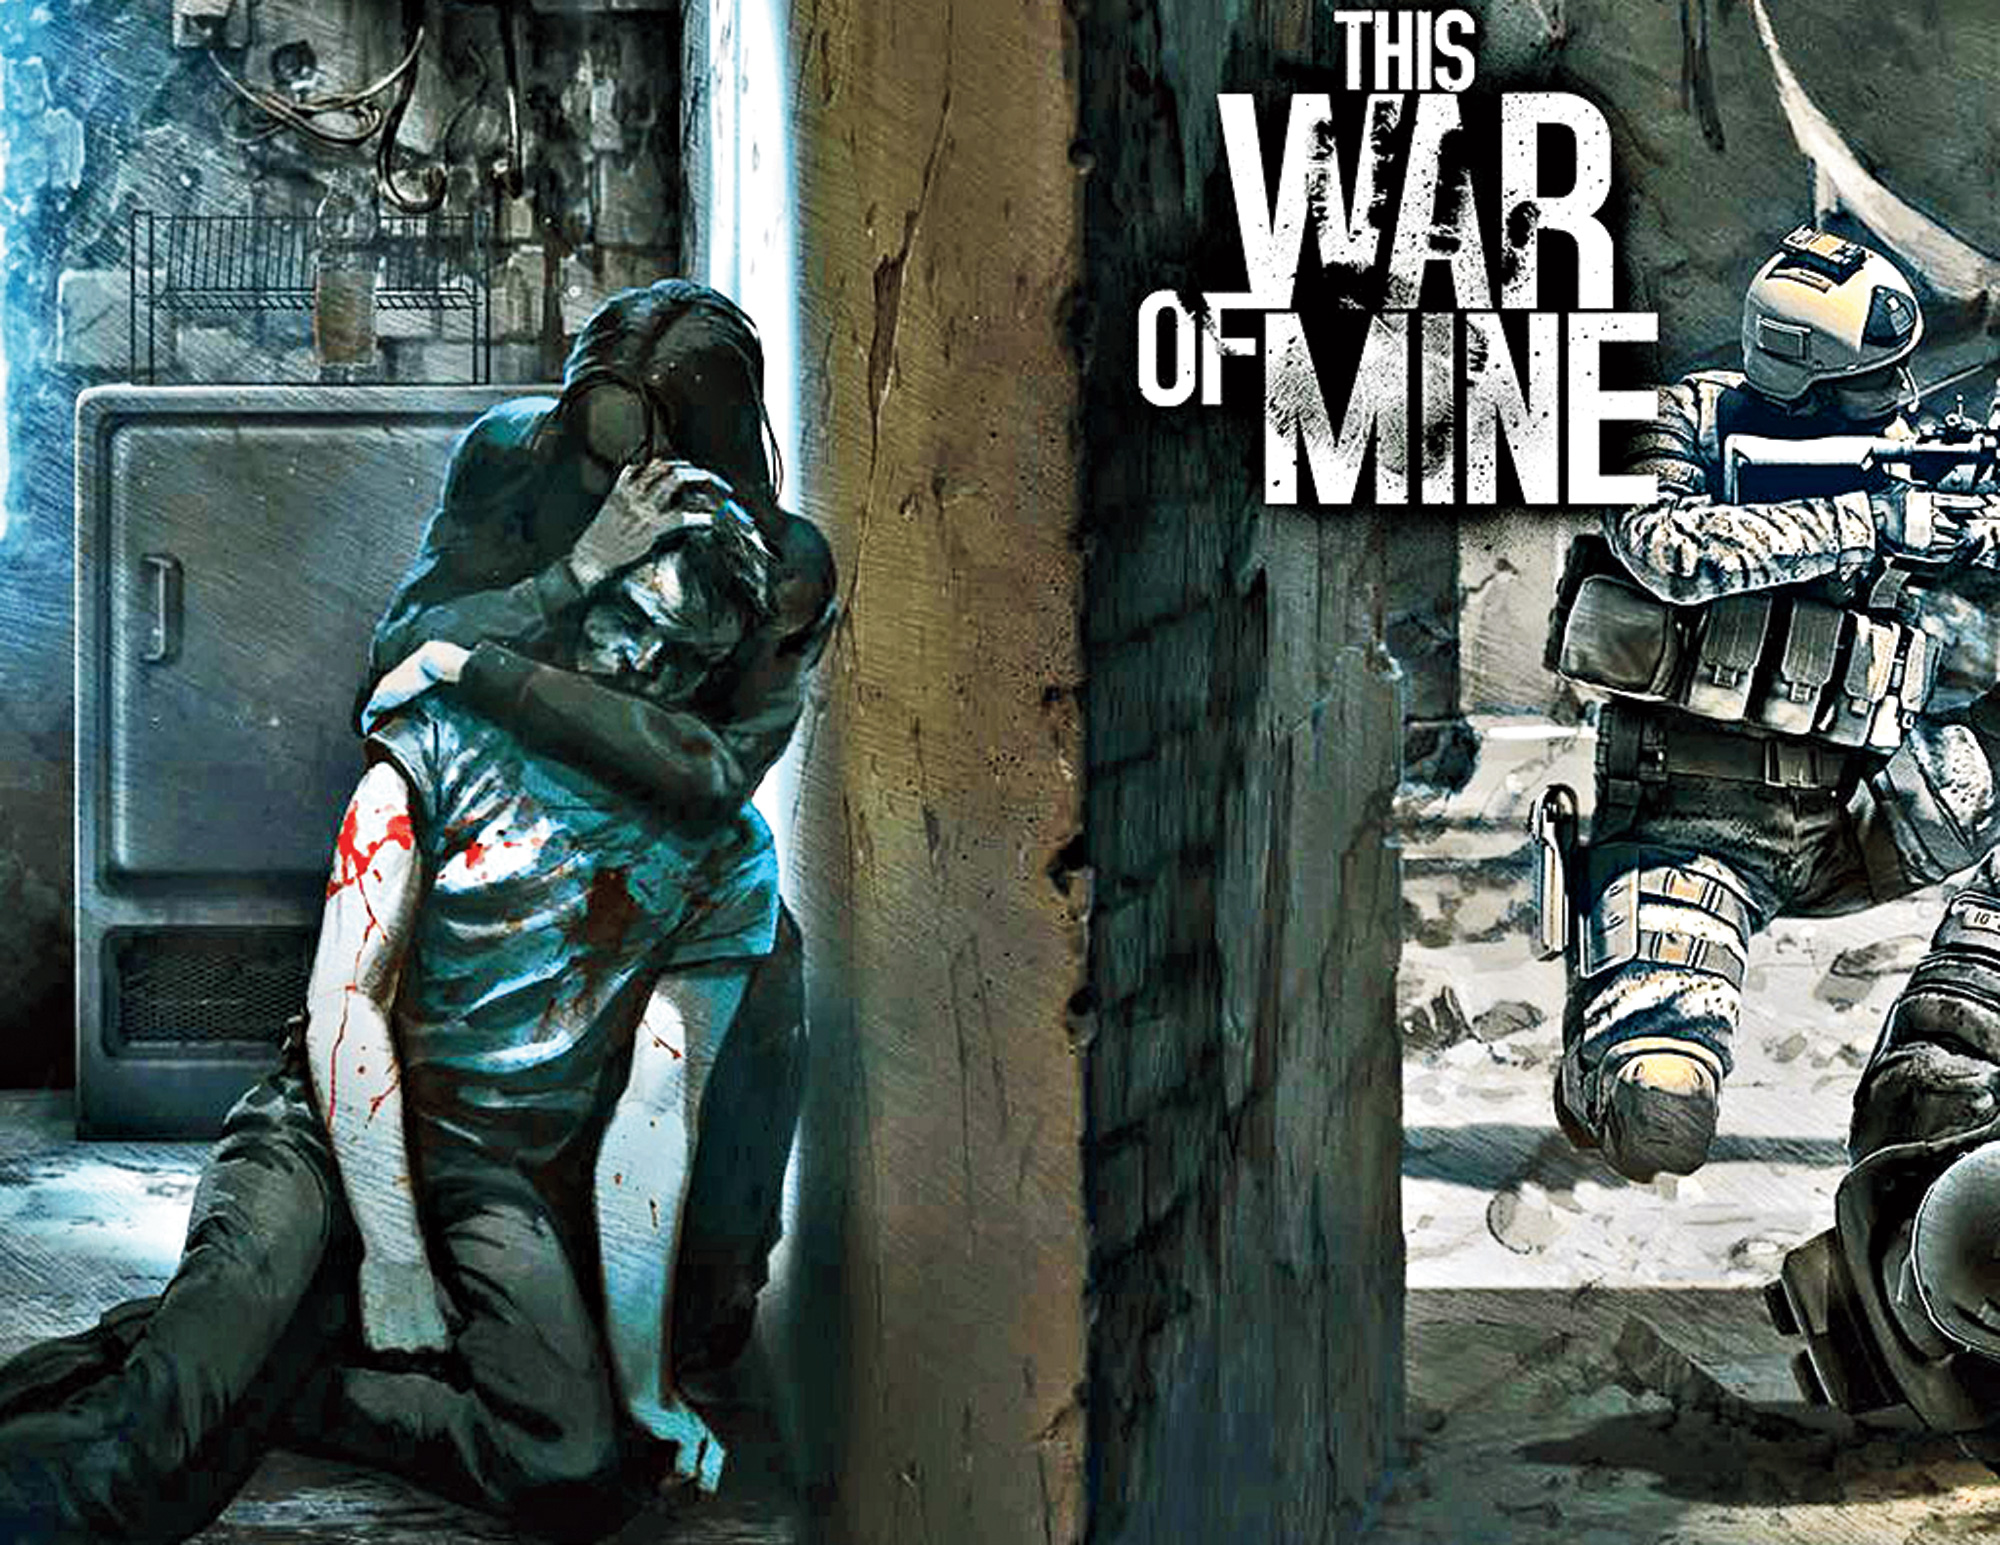 This War of Mine by 11 bit studios